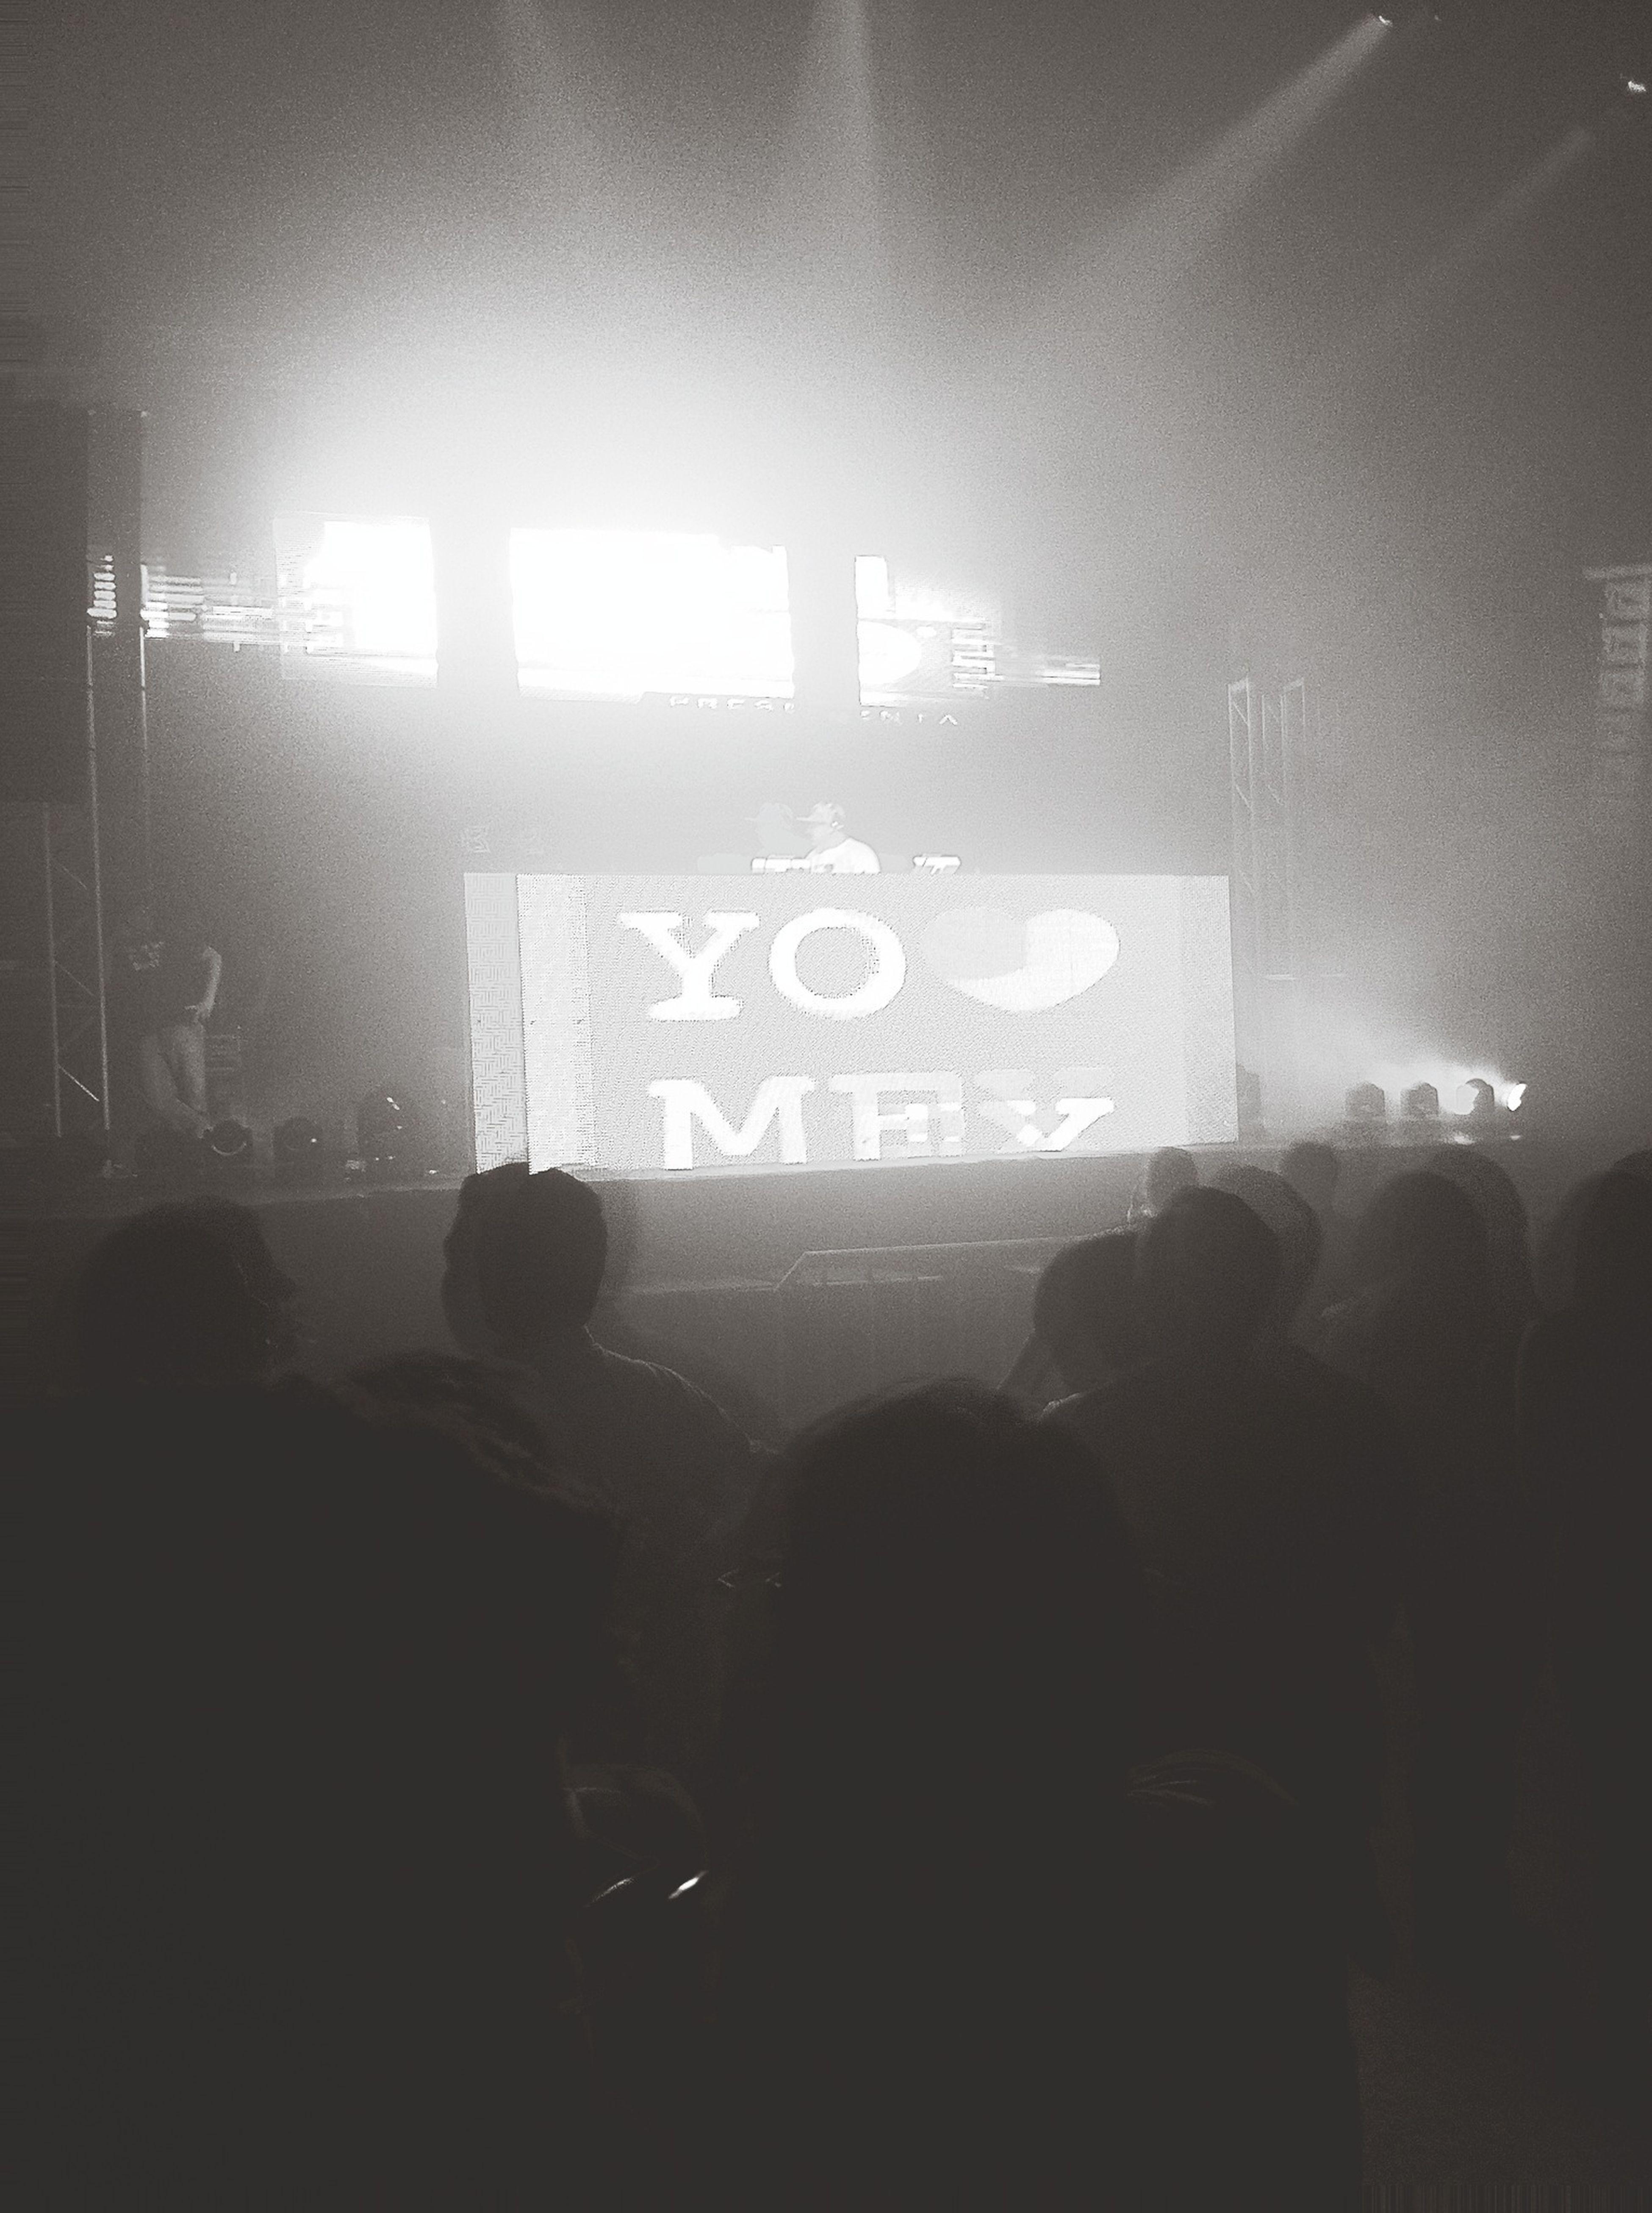 RockstarsDJFest / Concert / YoAmoMéxico